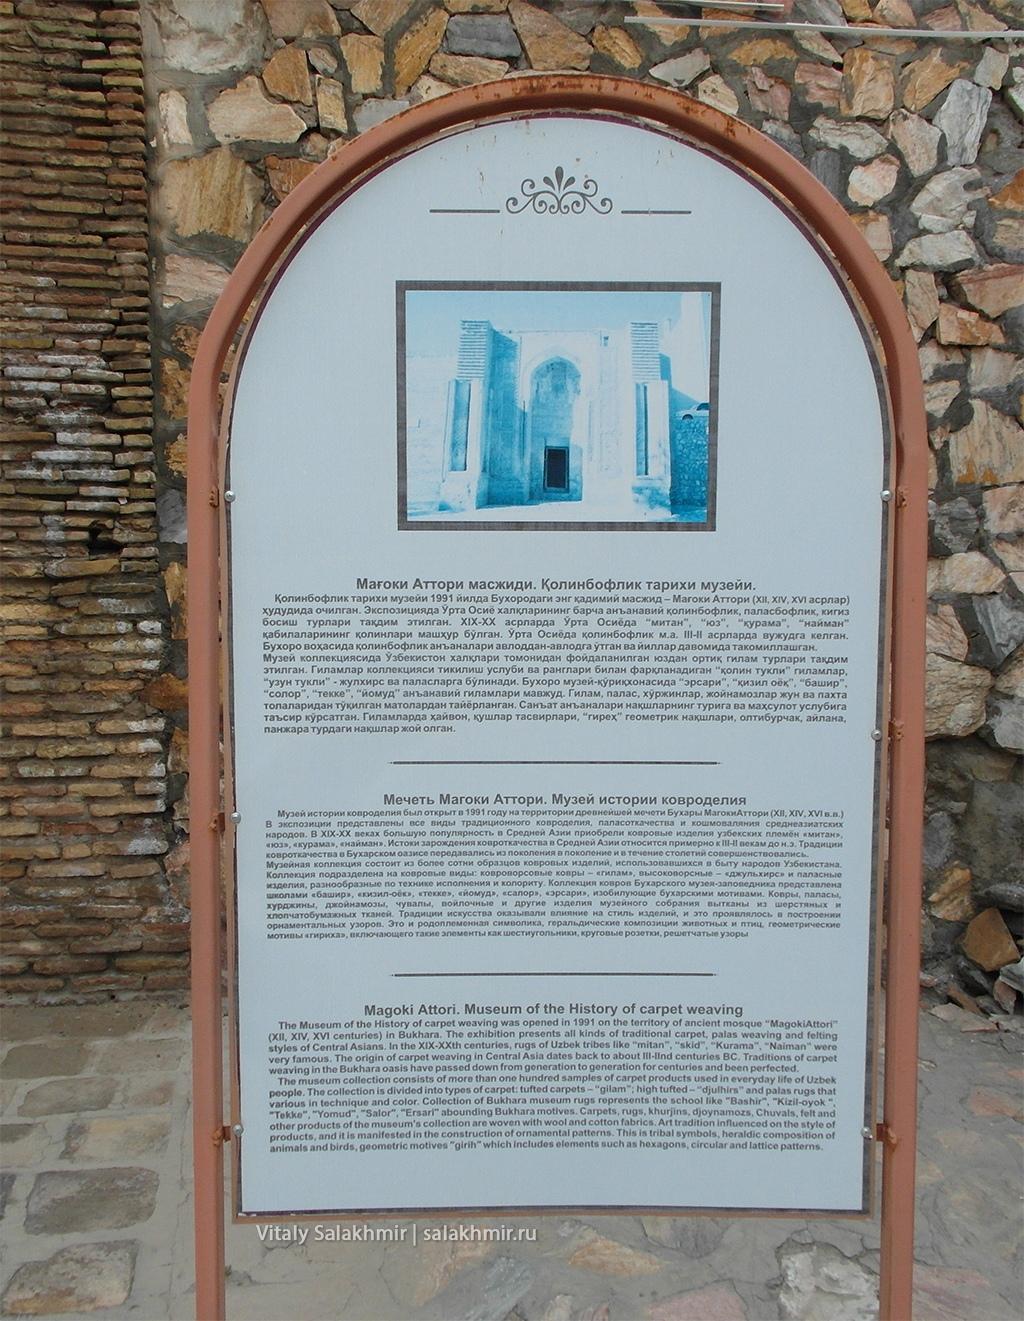 Пояснительная табличка, Узбекистан, Бухара 2019